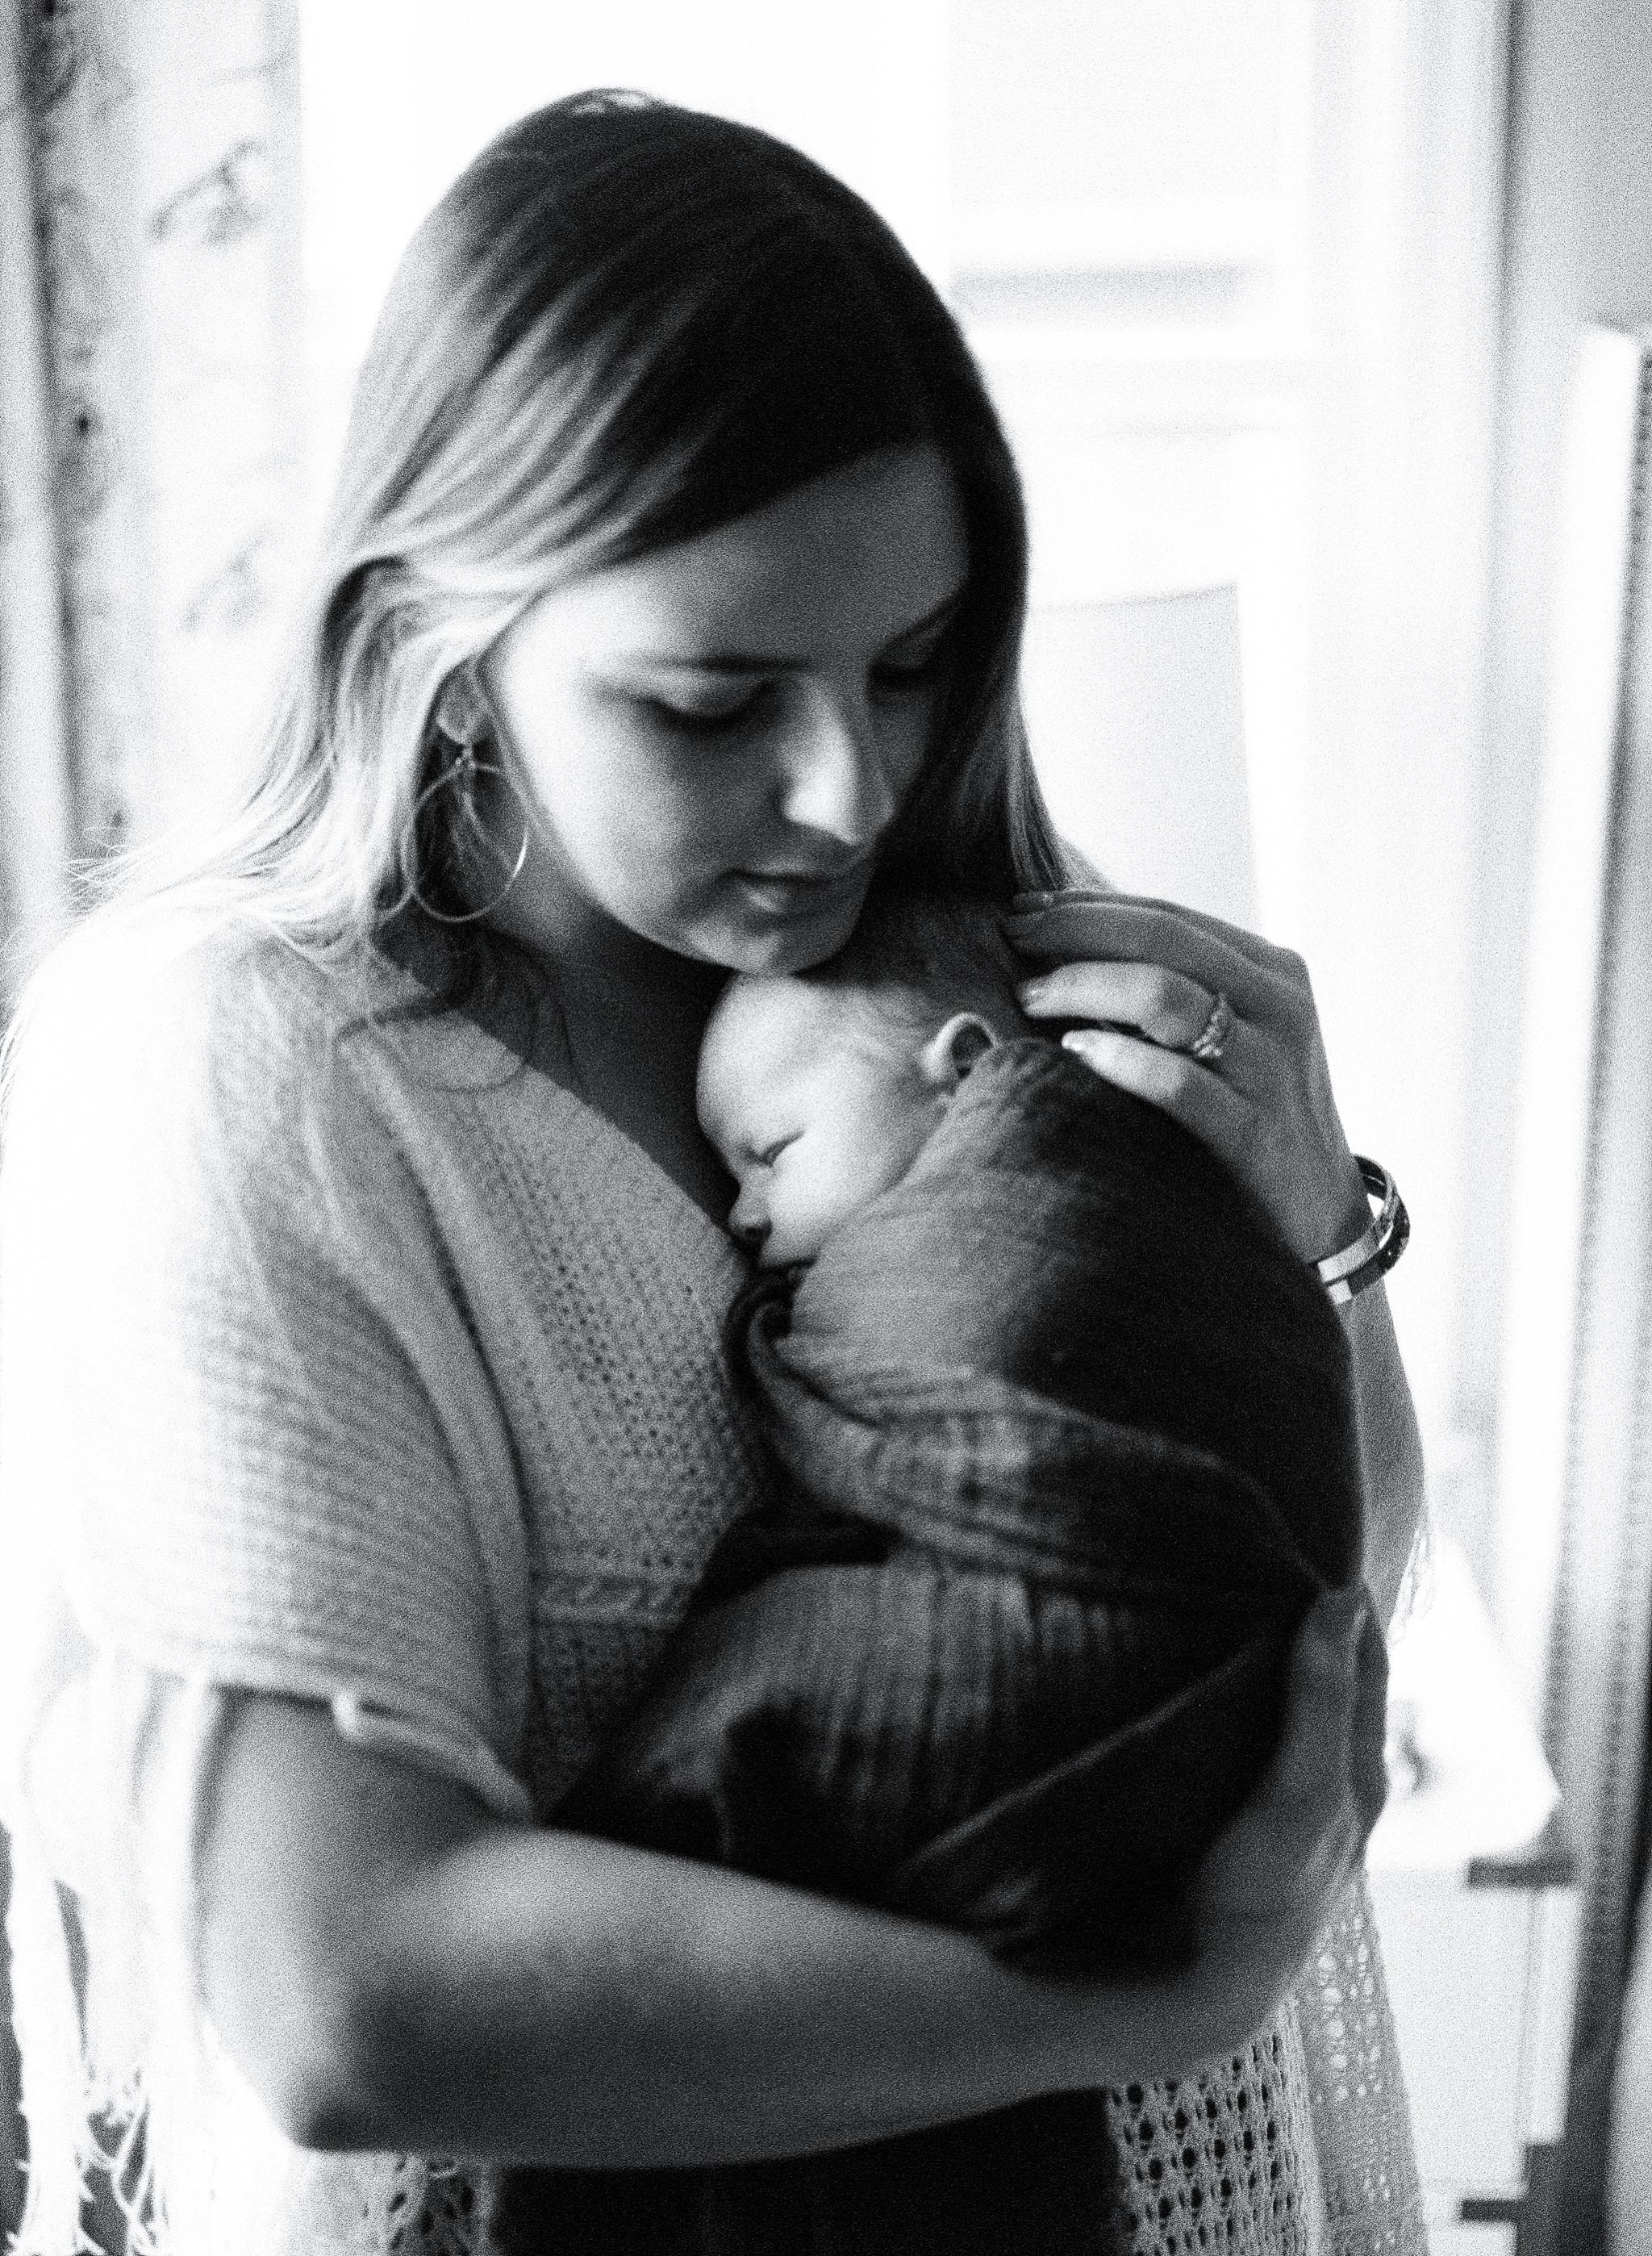 atlanta-georgia-fine-art-film-newborn-photographer-kaitlynne-grice-64.jpg